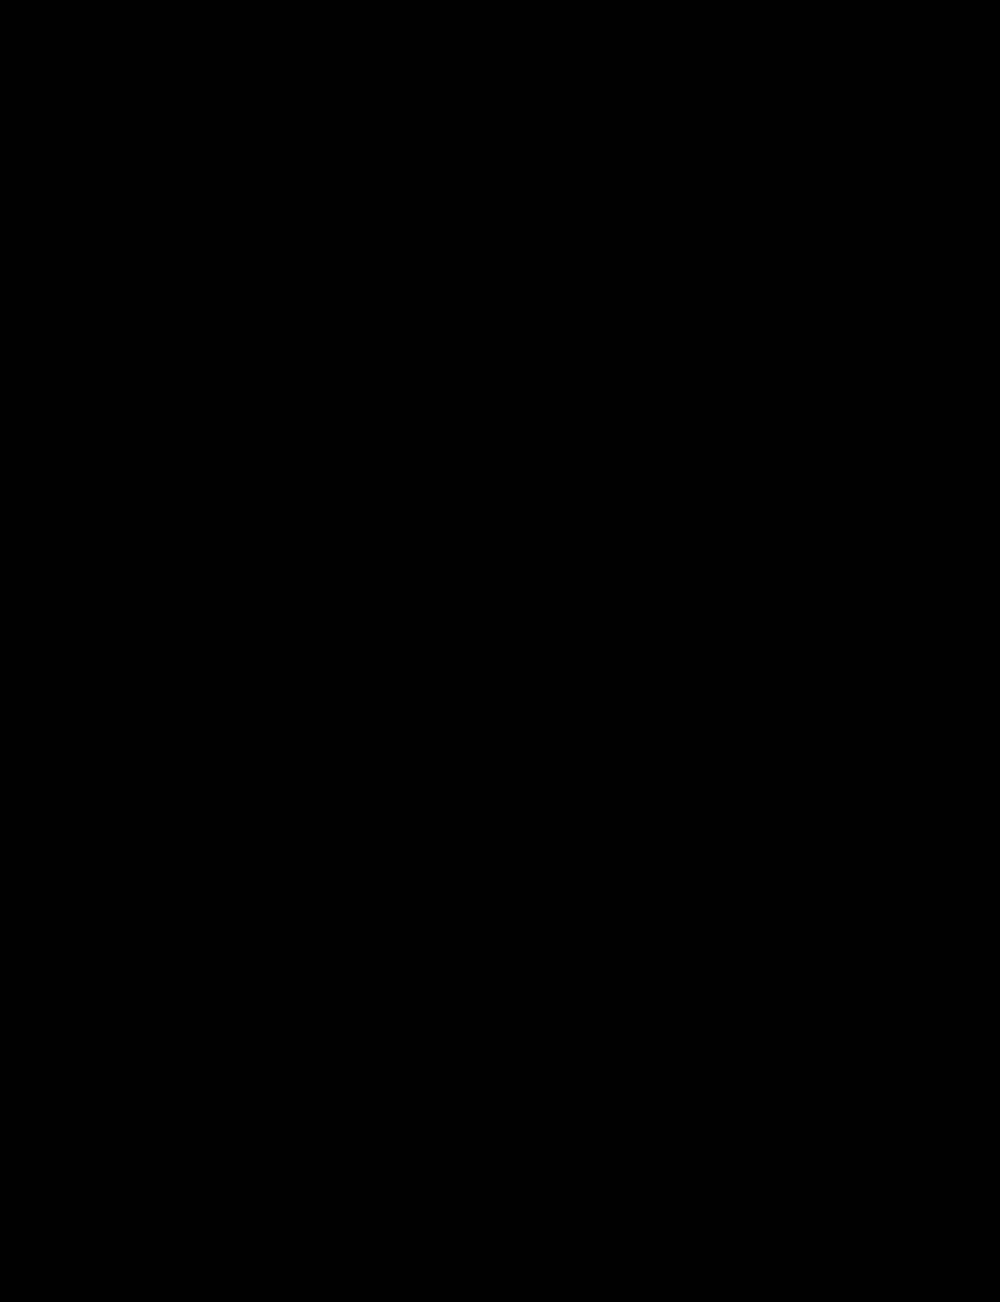 La demi-frange